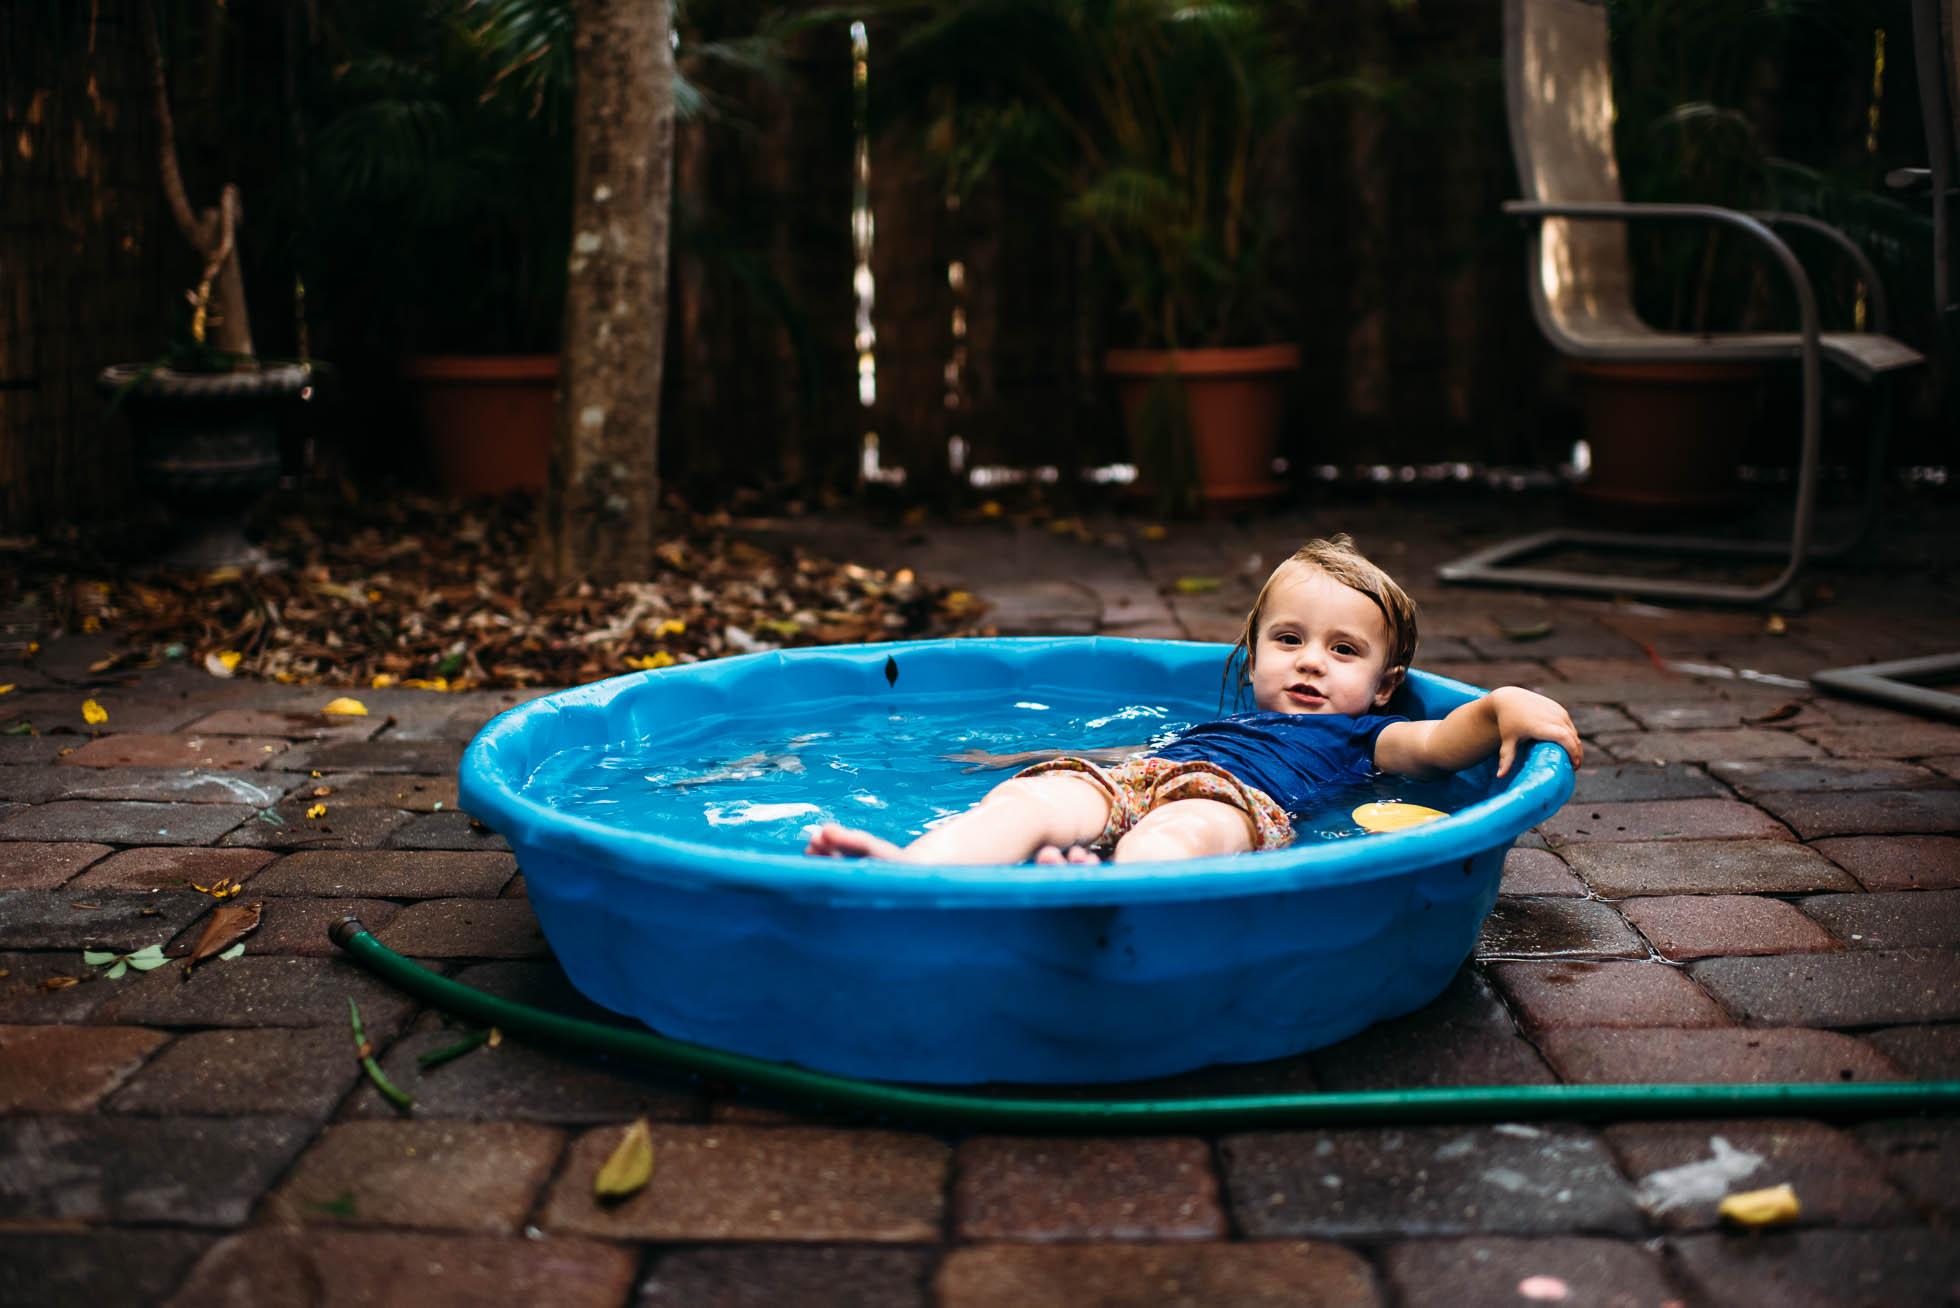 Toddler wearing clothes in kiddie pool.